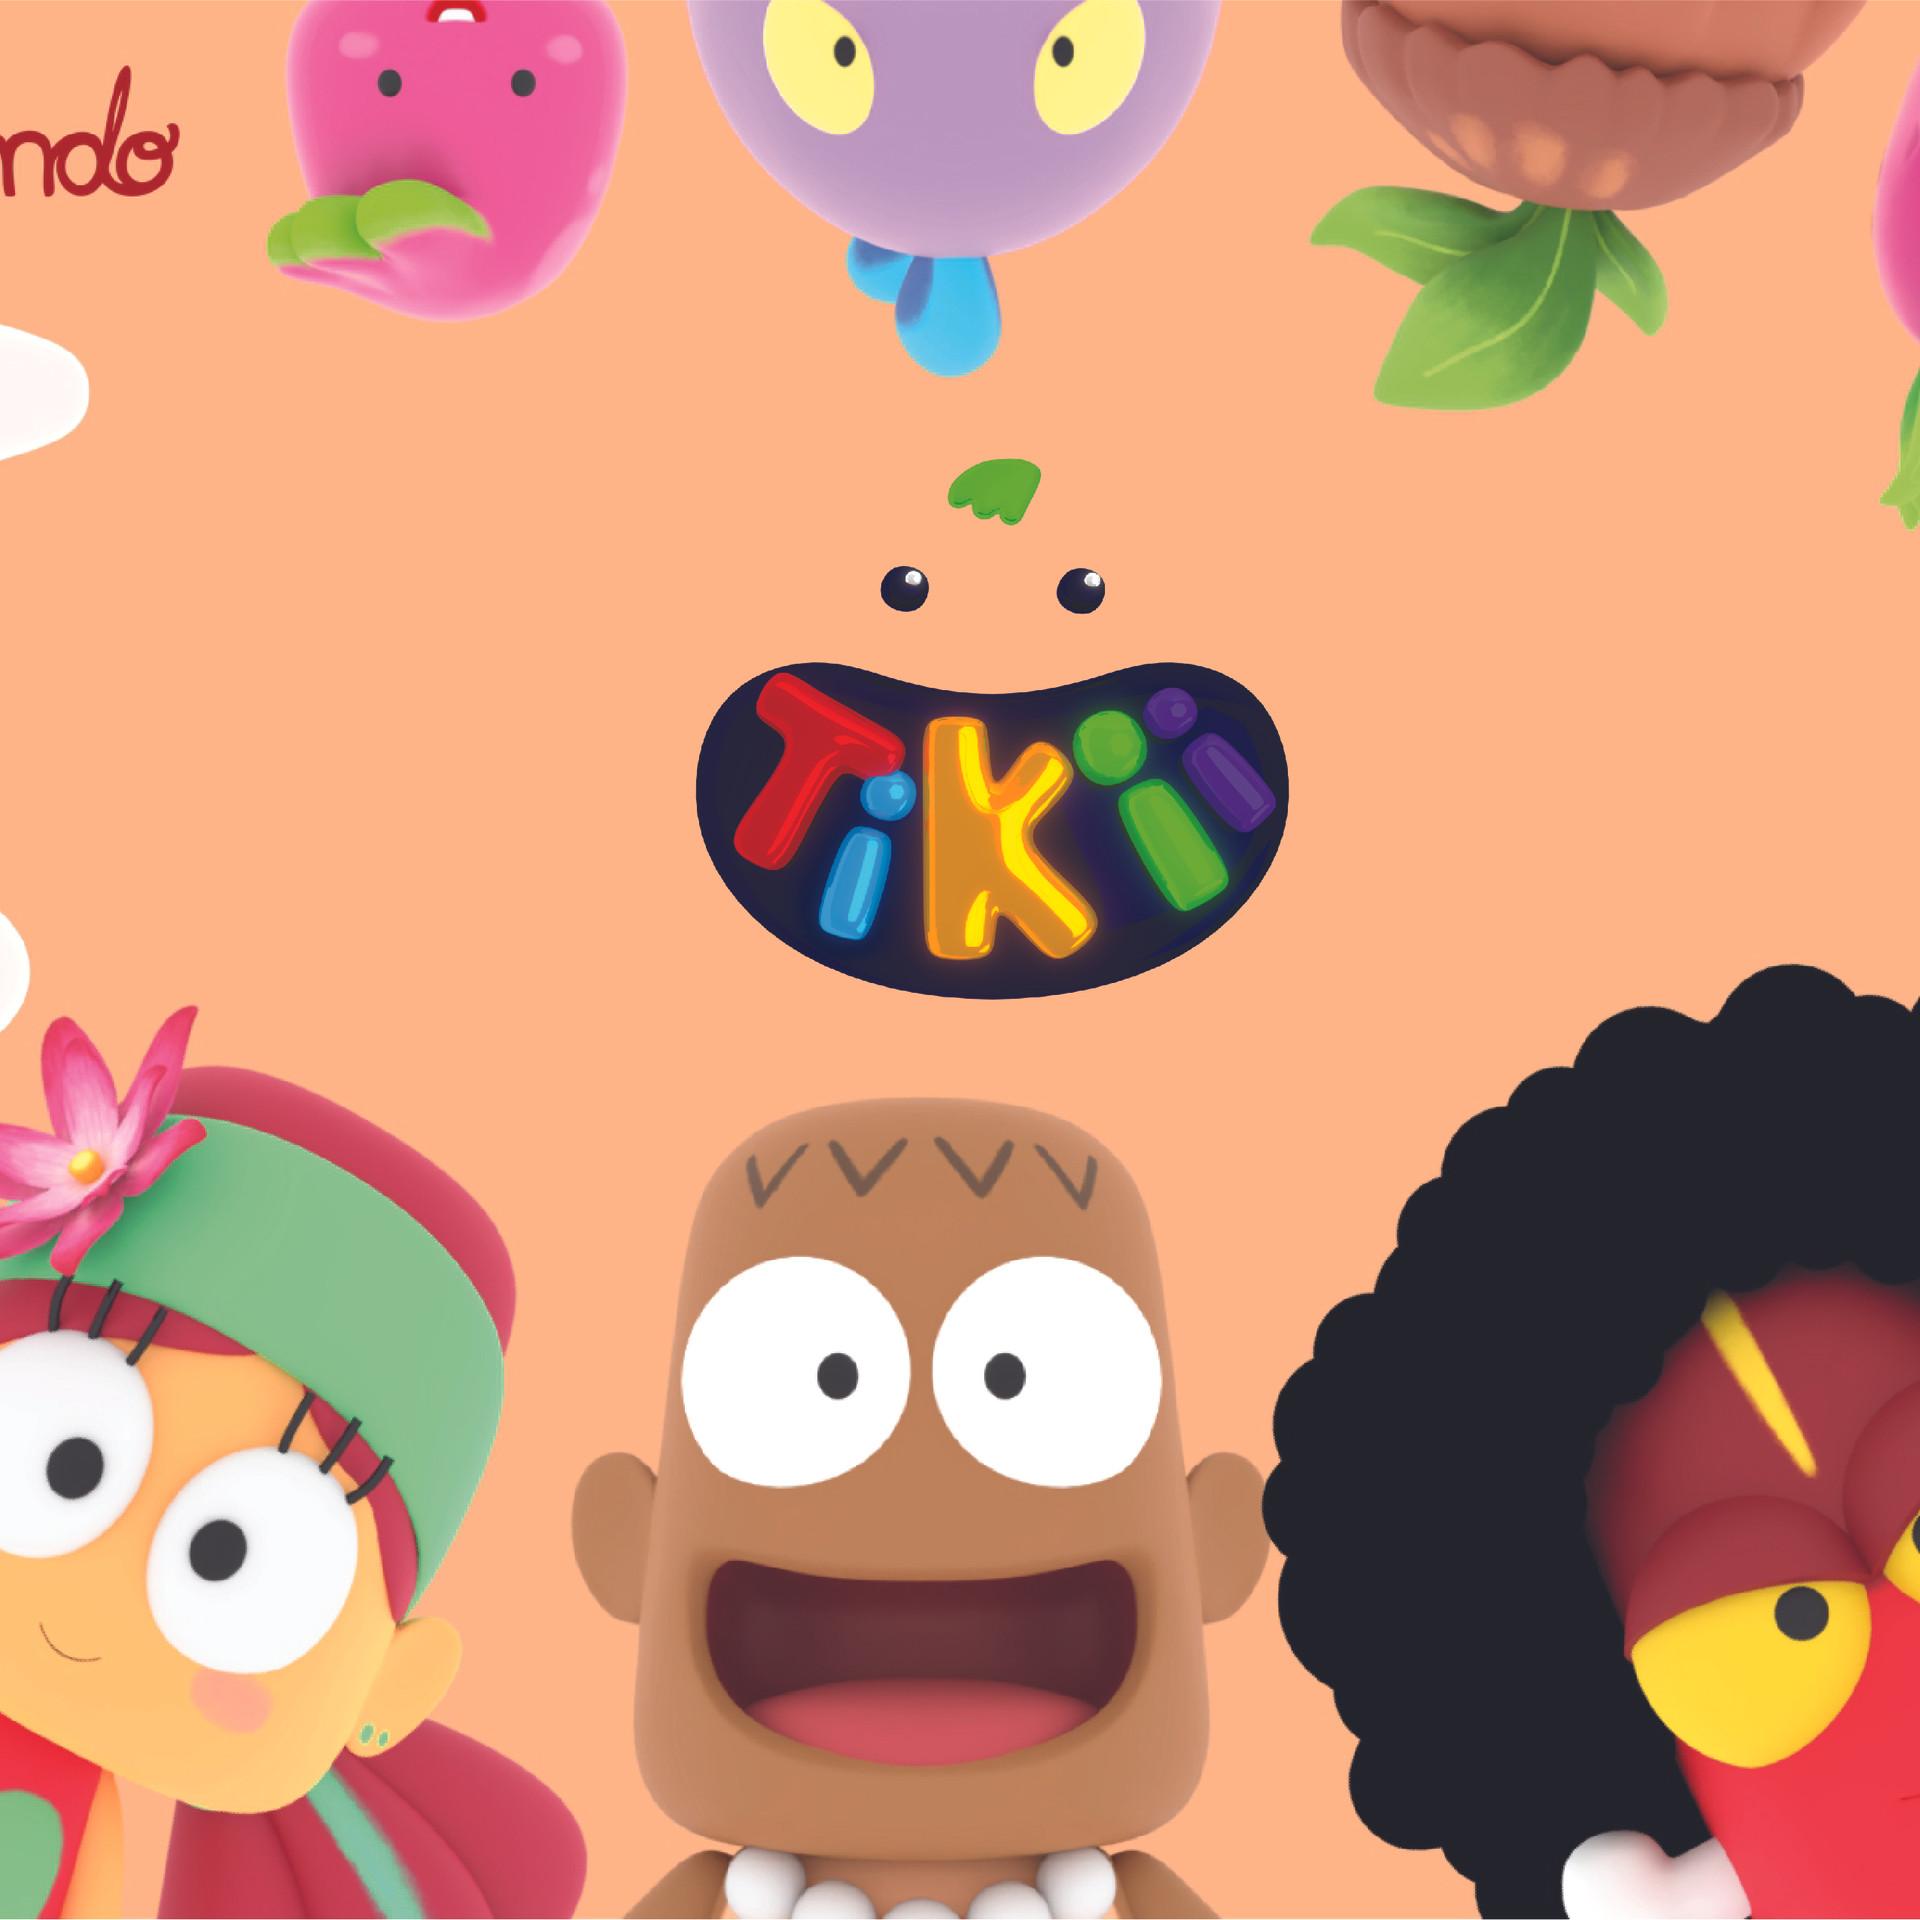 Tikii Animation